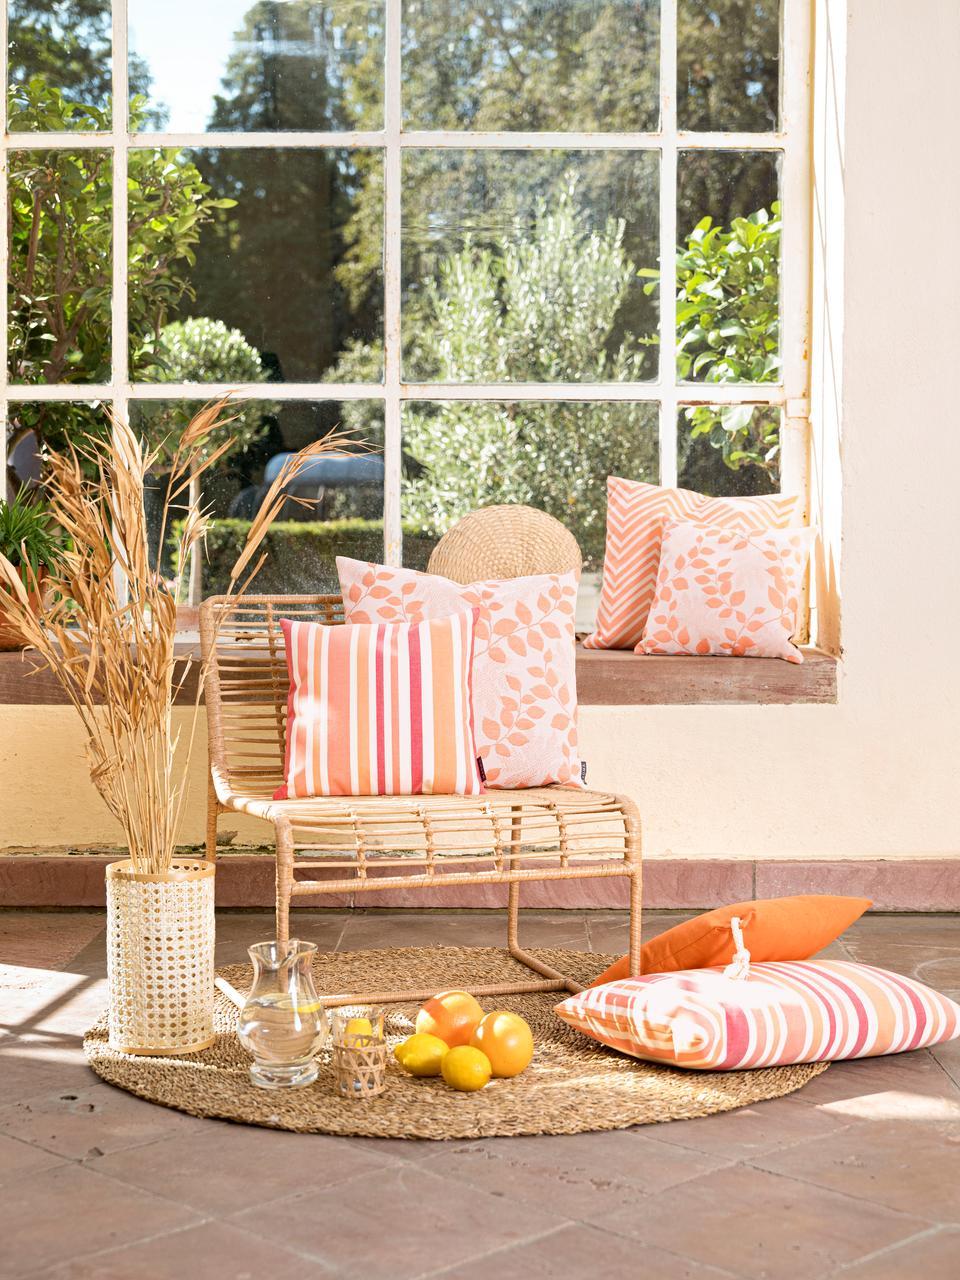 Gestreifte Outdoor-Kissenhülle Marbella, 100% Dralon® Polyacryl, Orange, Weiß, Rosatöne, 40 x 60 cm